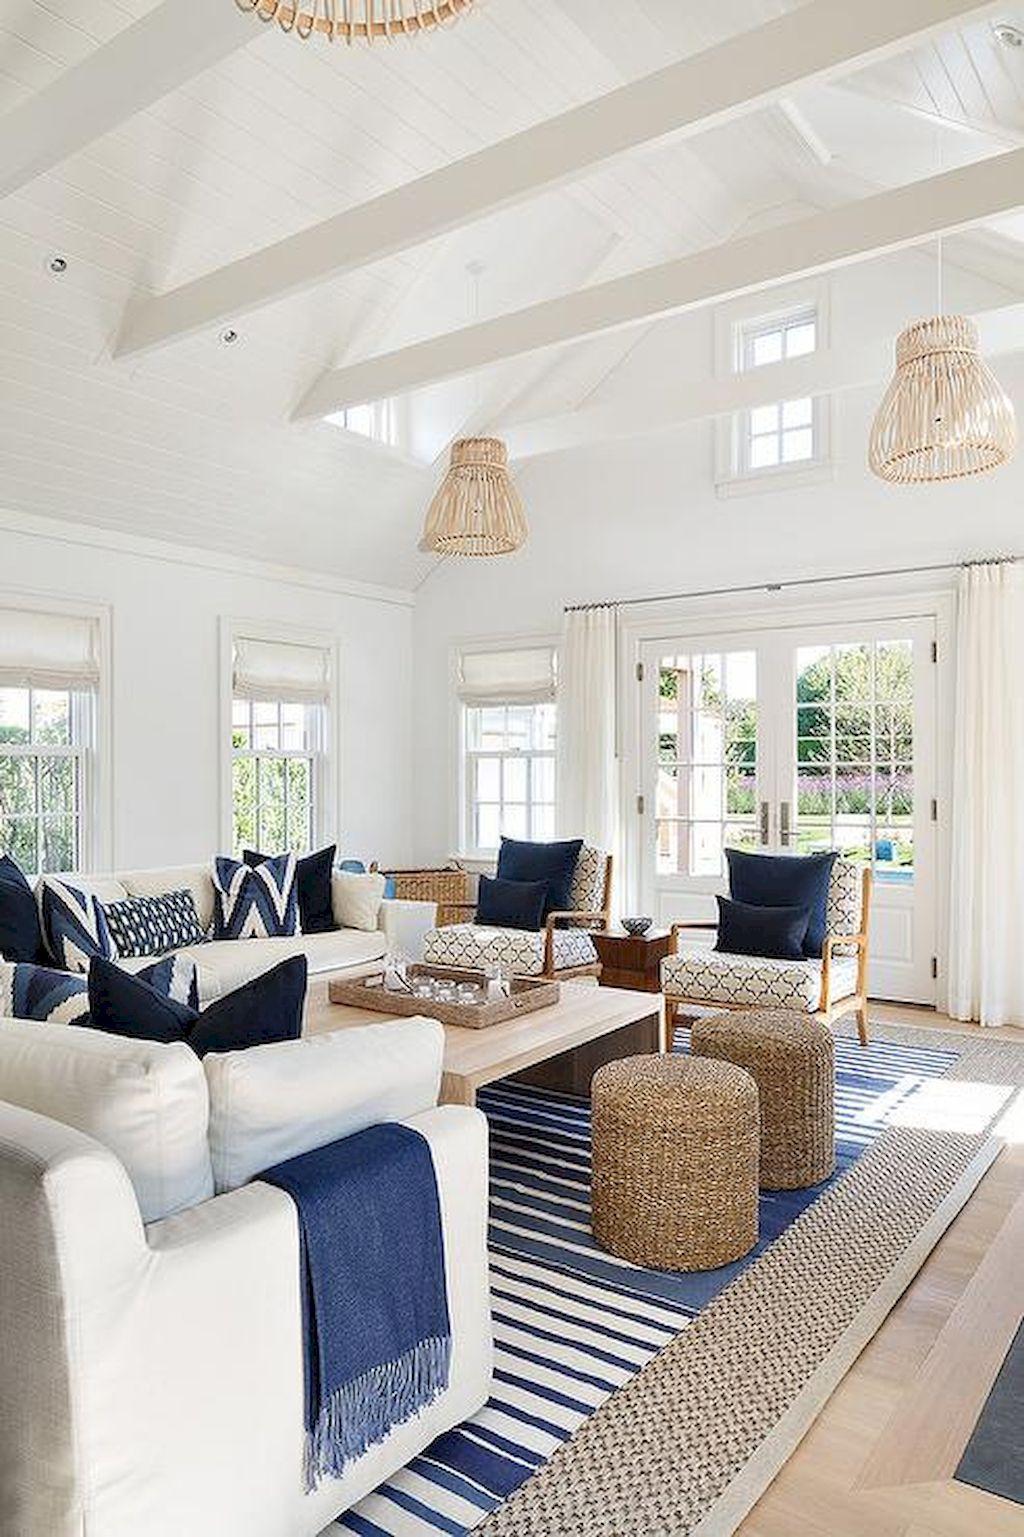 85 Cozy Coastal Living Room Decorating Ideas | Coastal living rooms ...